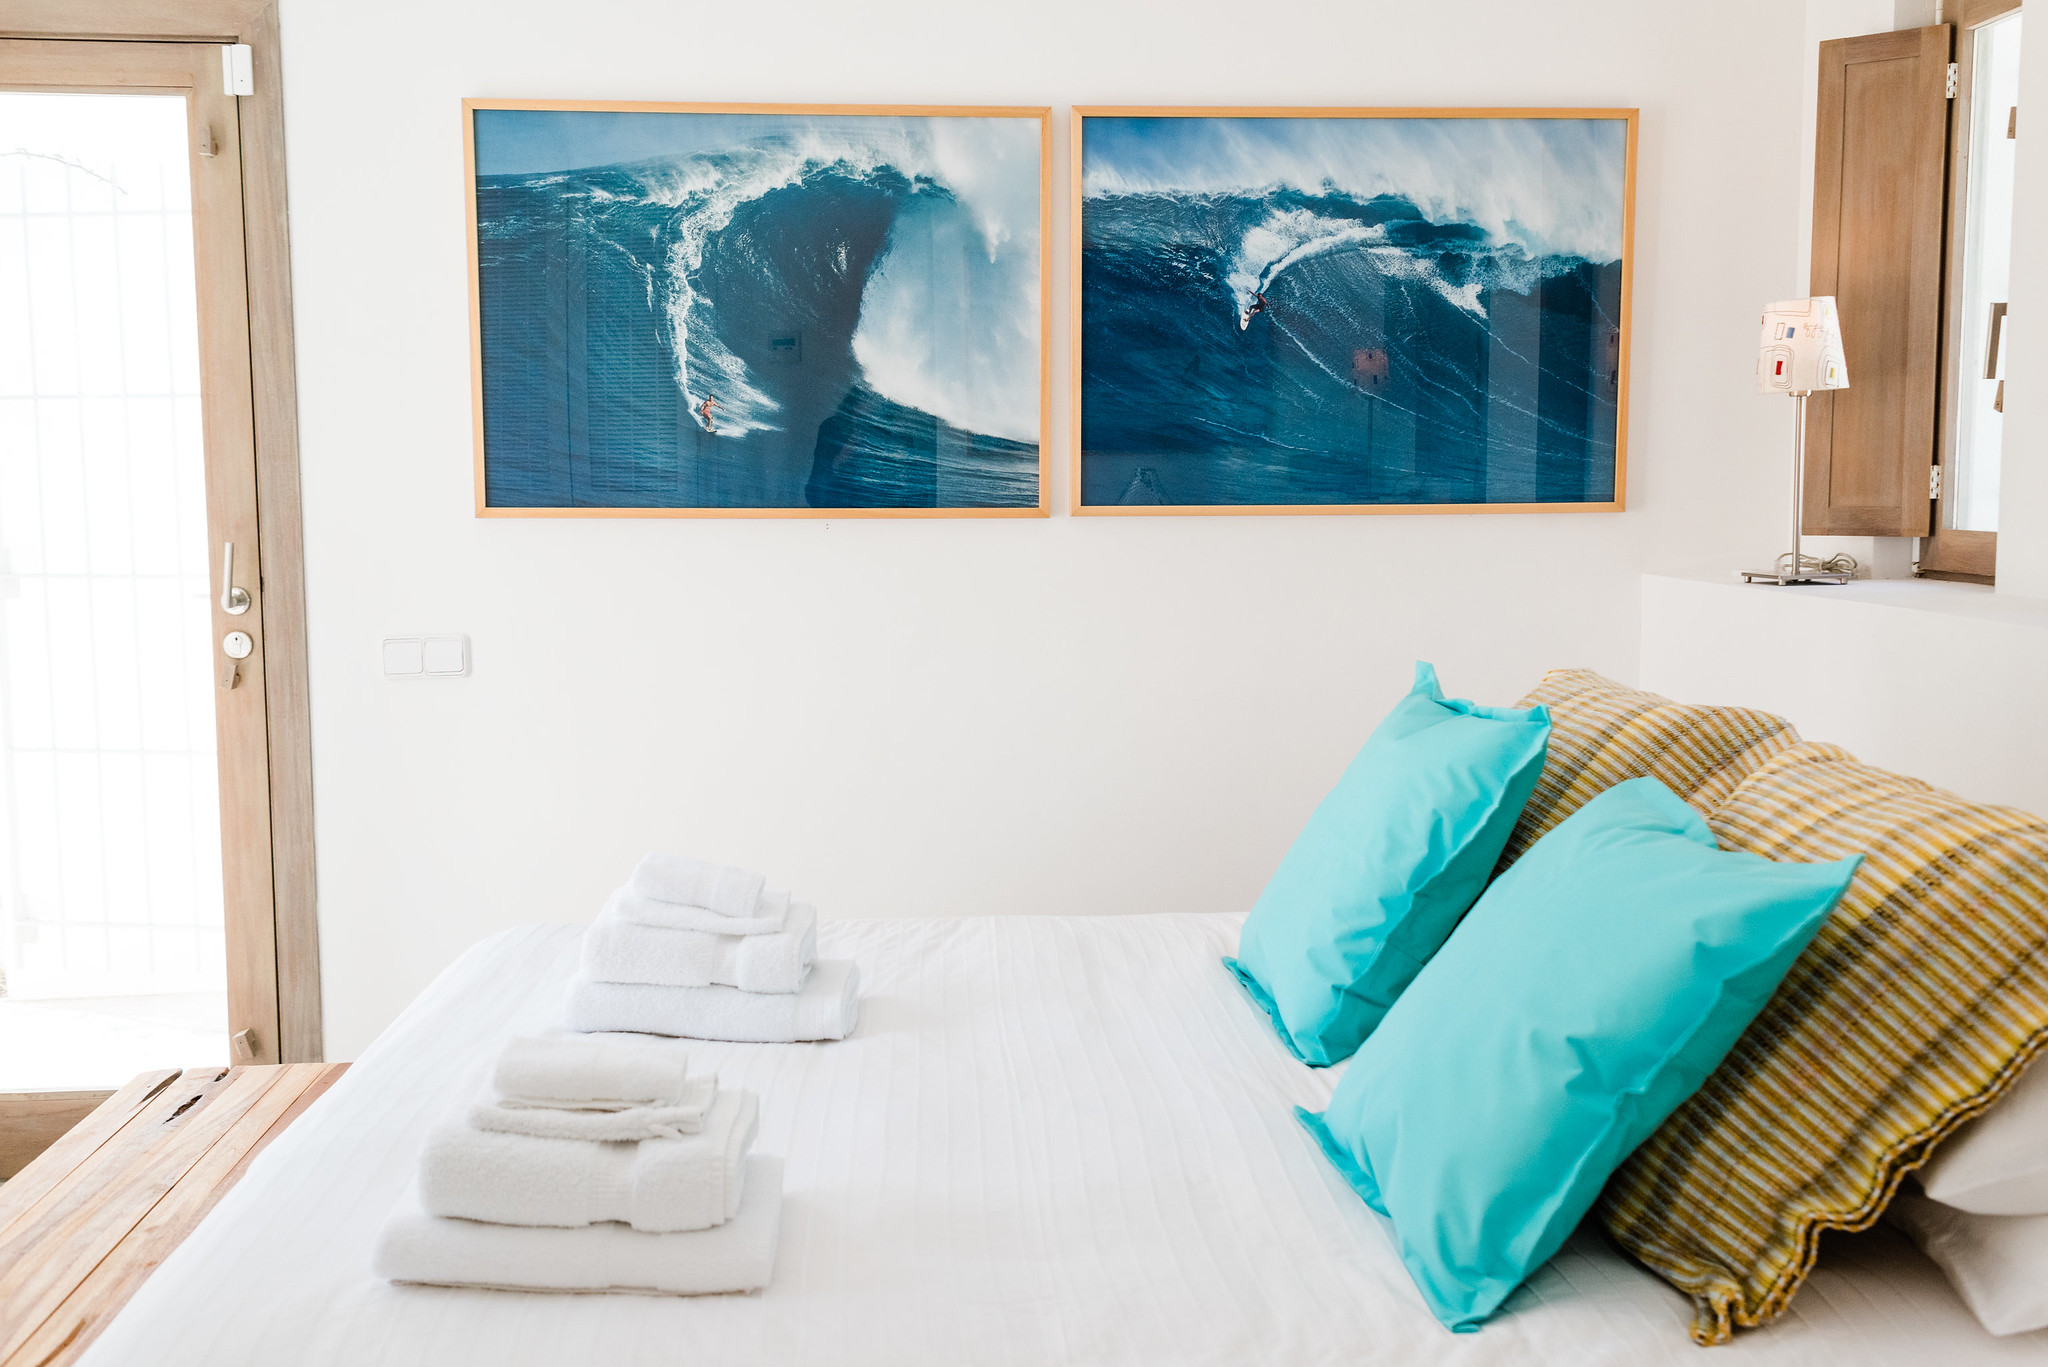 https://www.white-ibiza.com/wp-content/uploads/2020/06/white-ibiza-villas-casa-nyah-interior-bedroom10.jpg